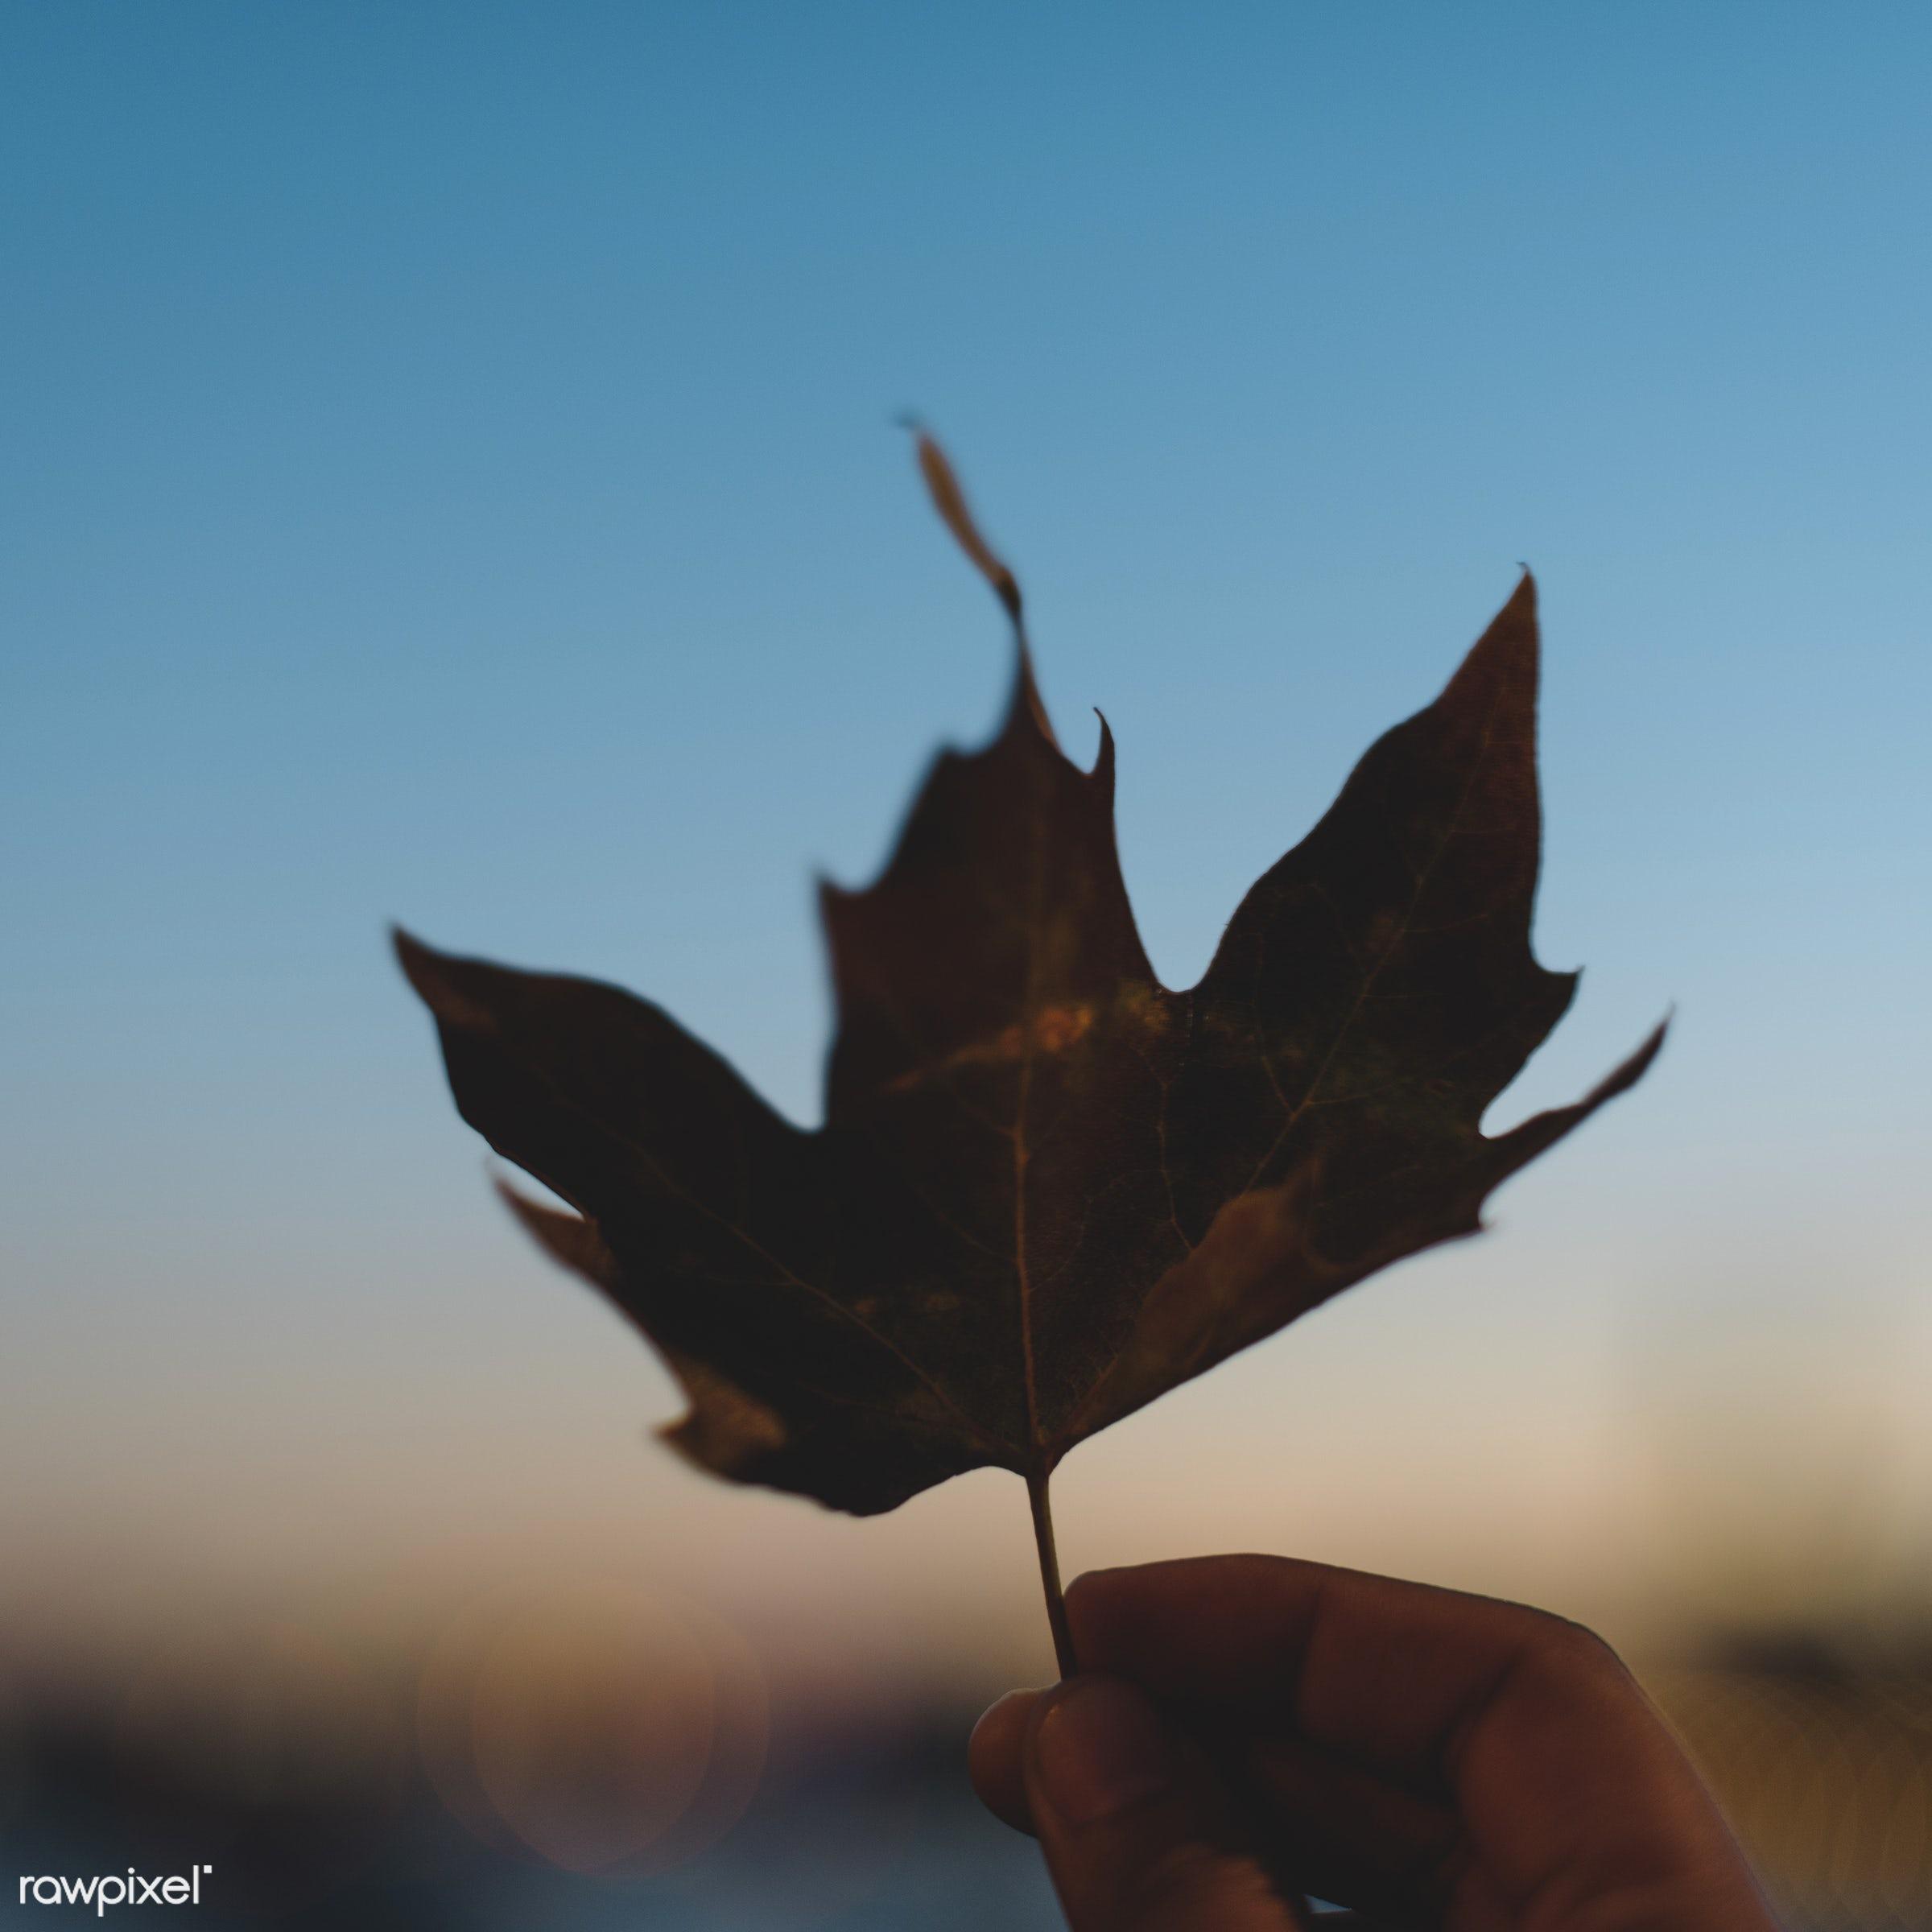 autumn, autumn leaves, beautiful, botanical, botany, defoliation, dry, fade, fall, falling, falling leaves, feminism,...